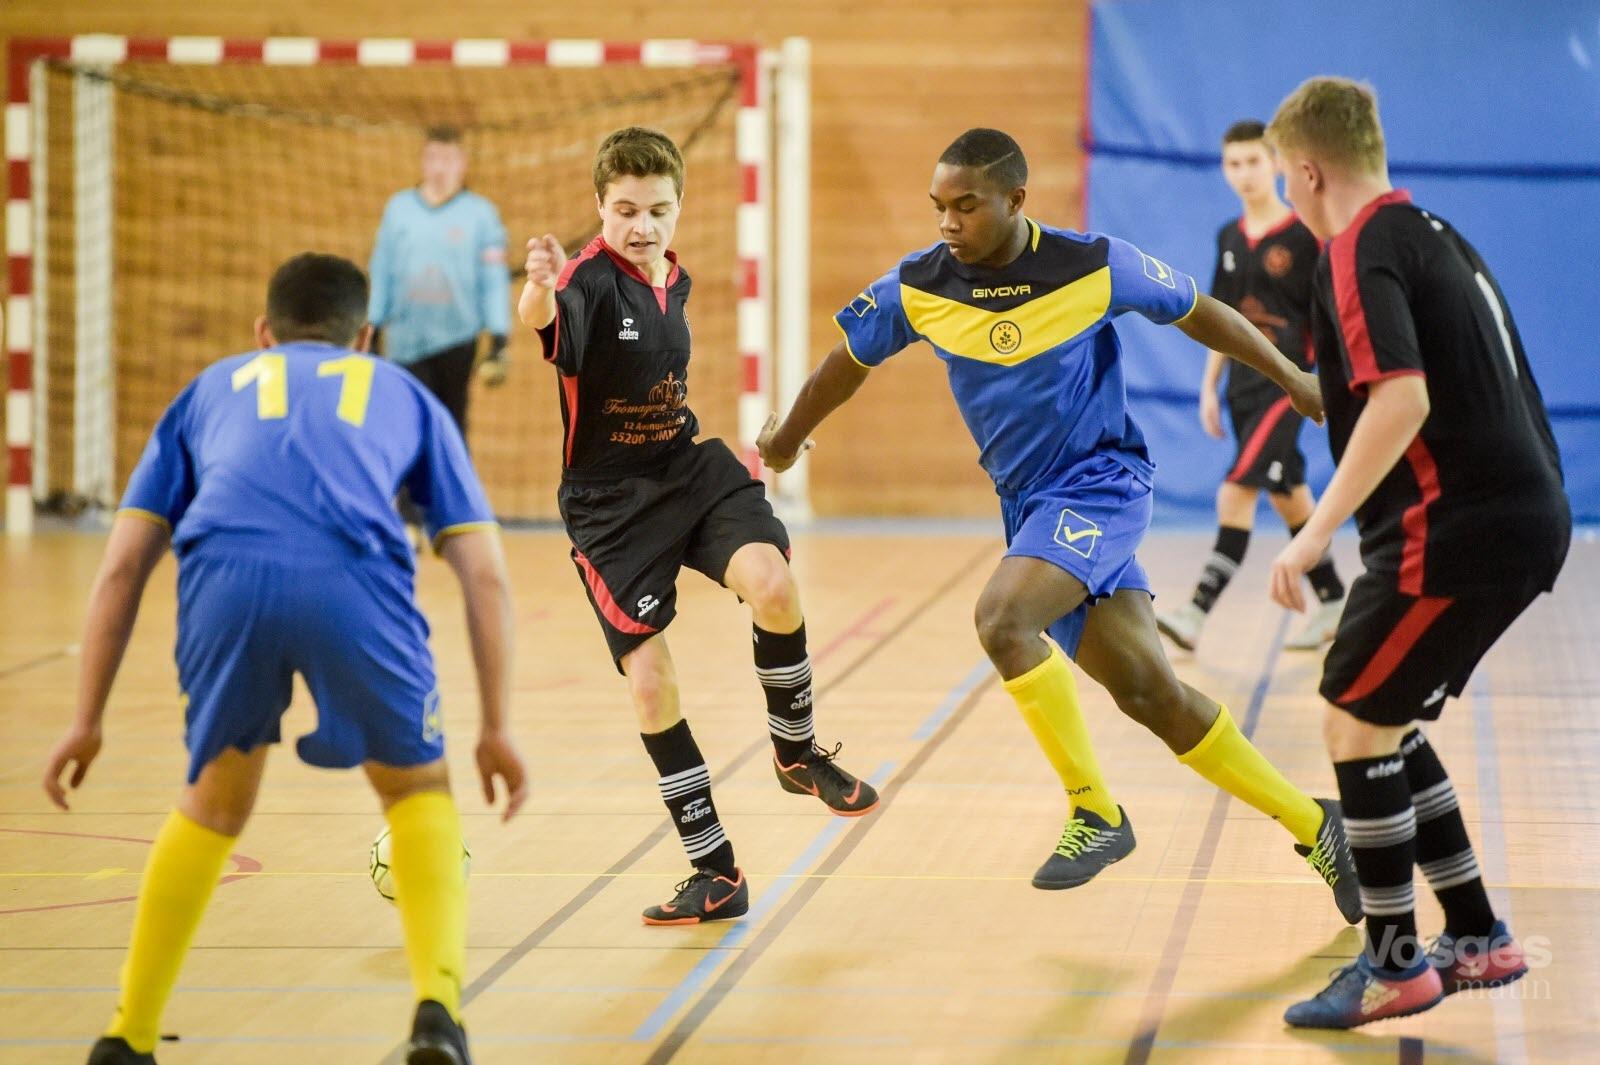 Finale régionale U19 Futsal : Herserange prive Epinal du titre régional U19